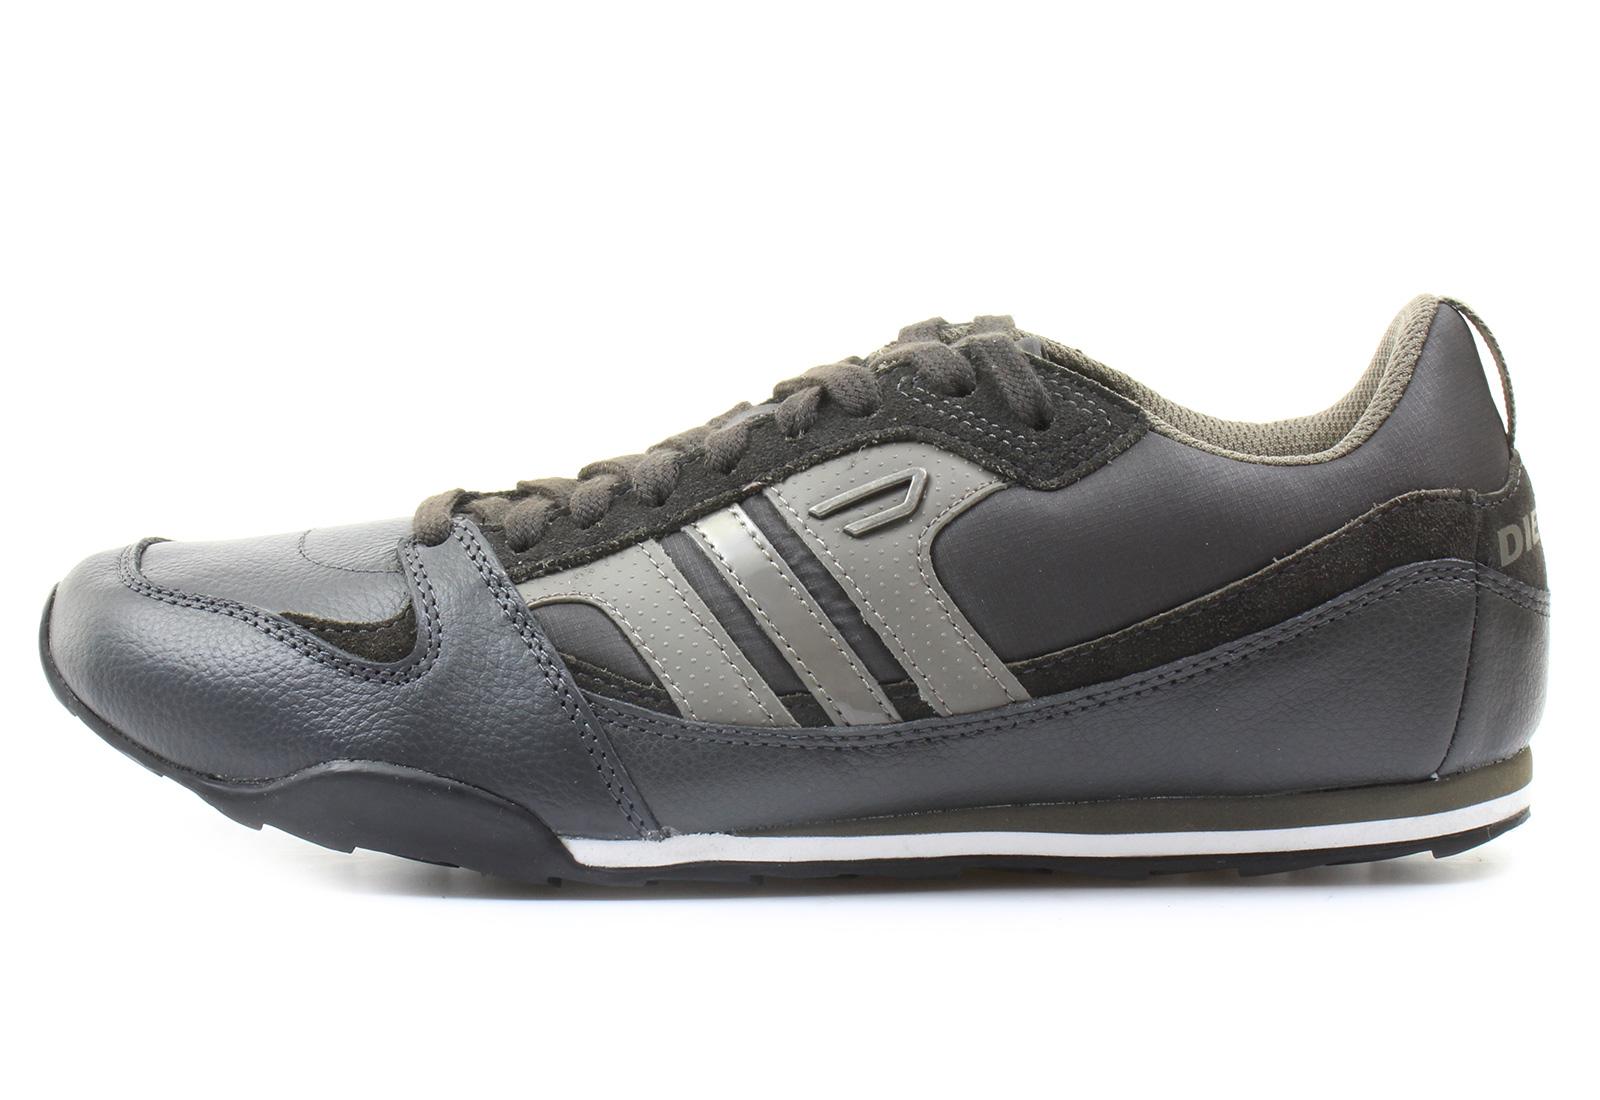 Diesel Shoes - Gunner S - 937-066-5395 - Online shop for ...